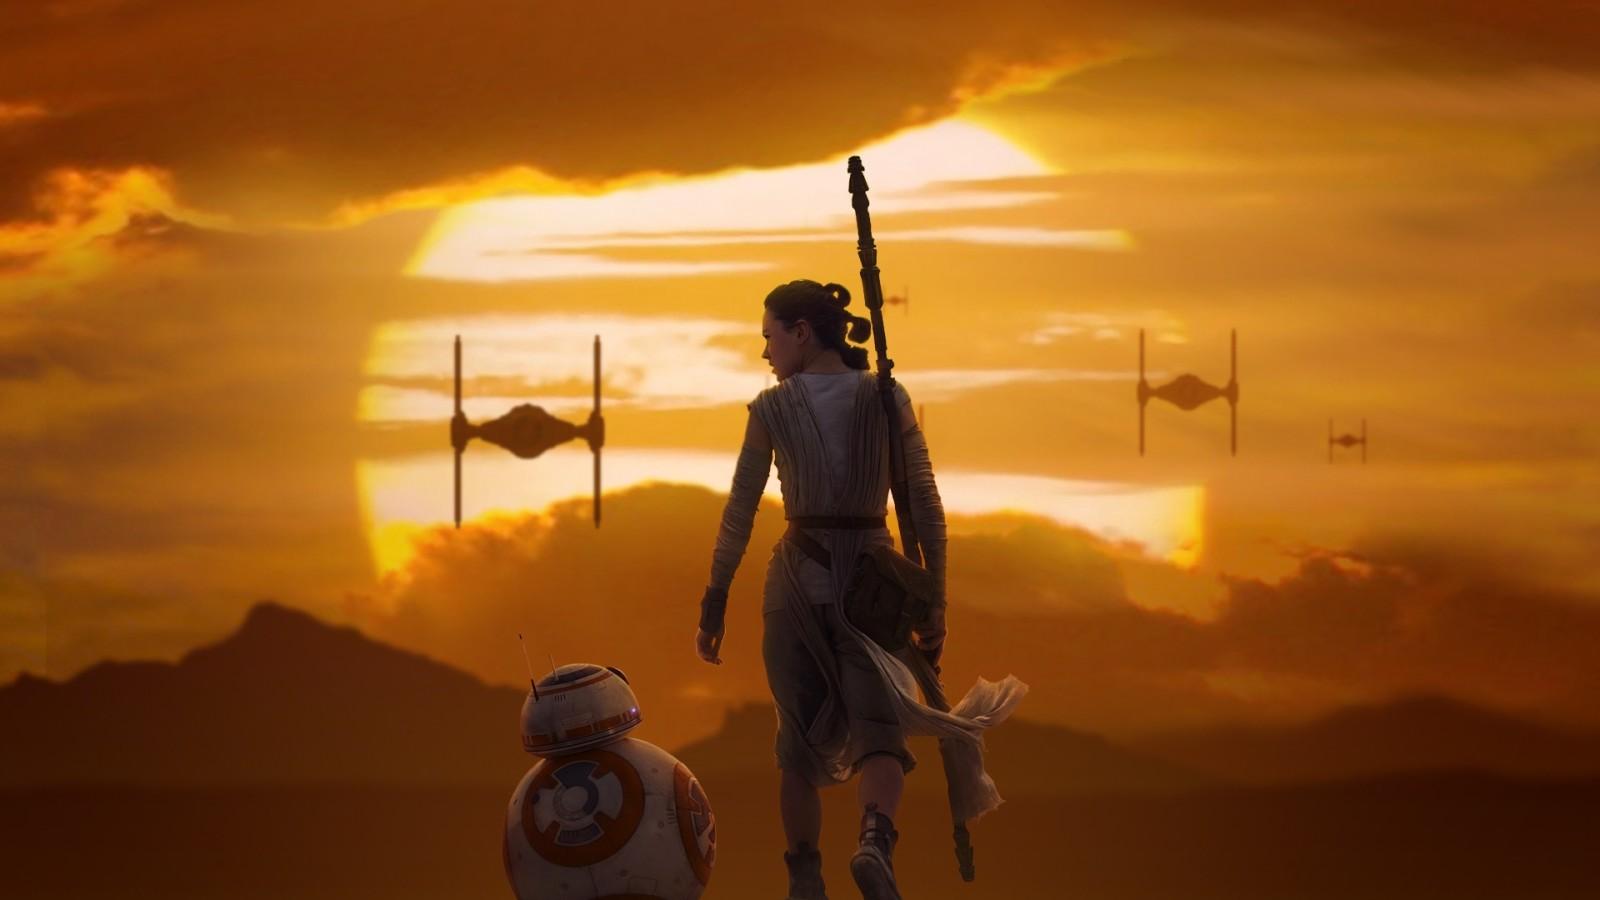 Rey BB 8 Star Wars The Force Awakens Wallpaper DESKTOP BACKGROUNDS 1600x900